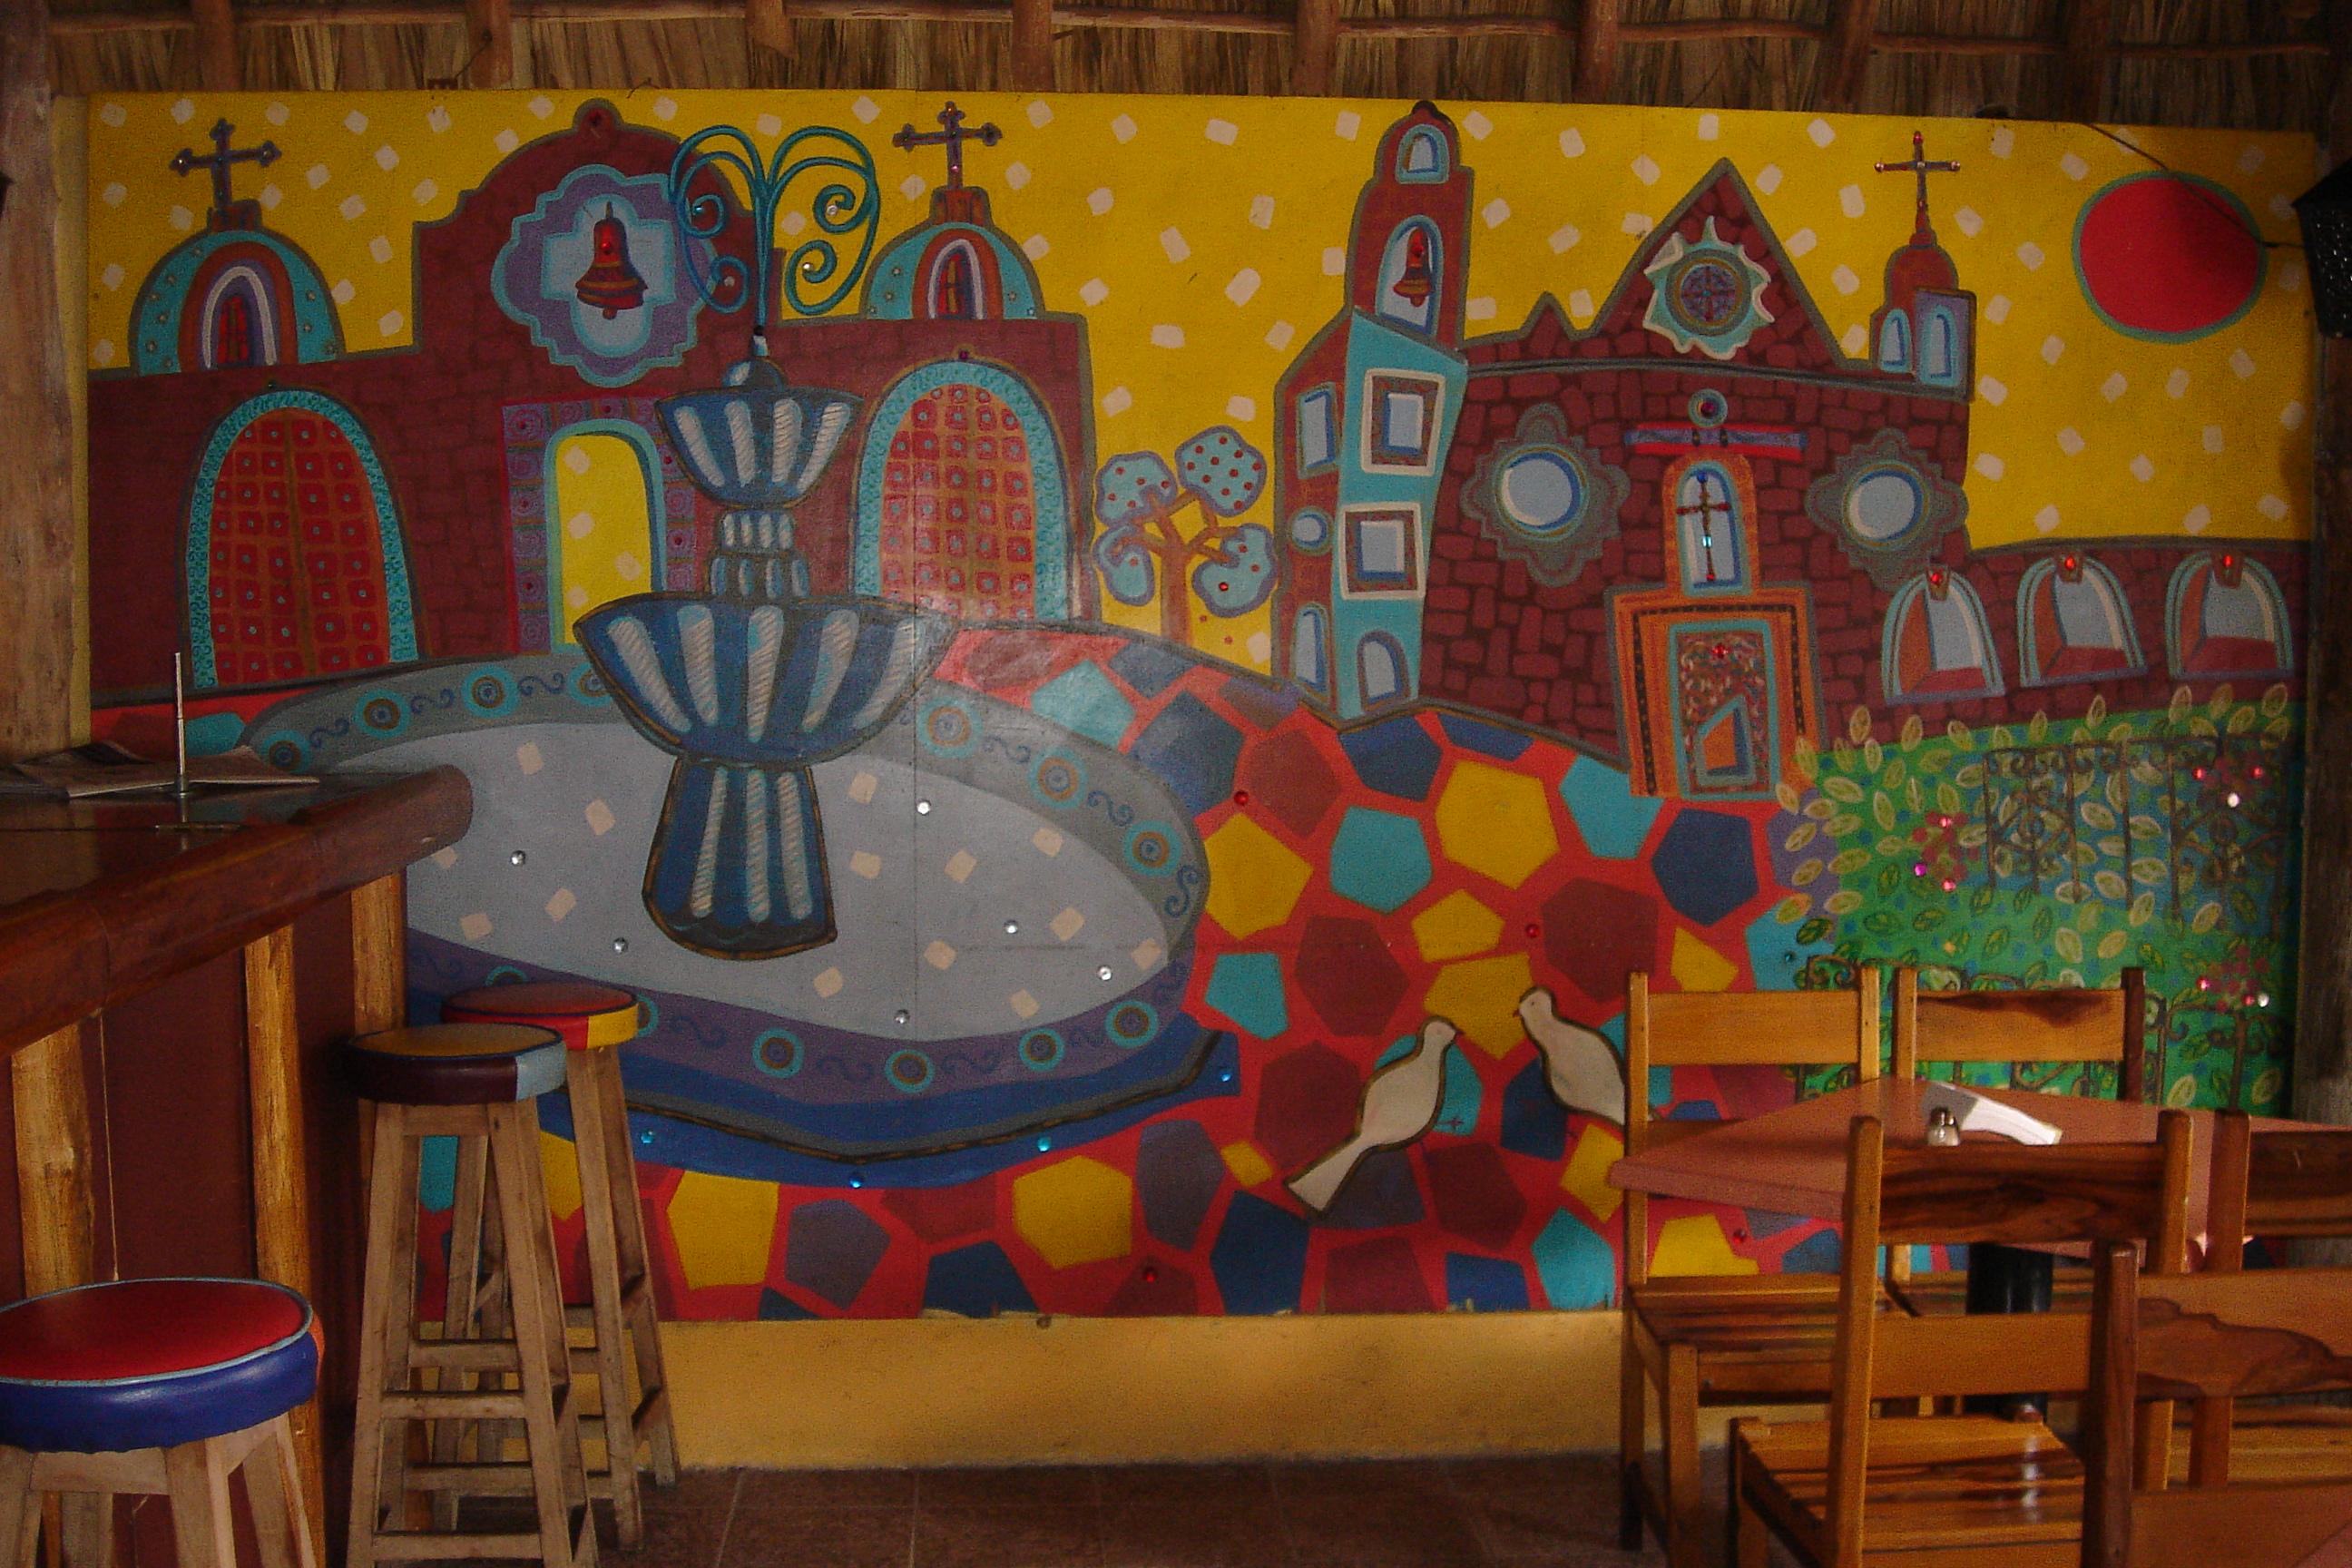 La Choza Mural